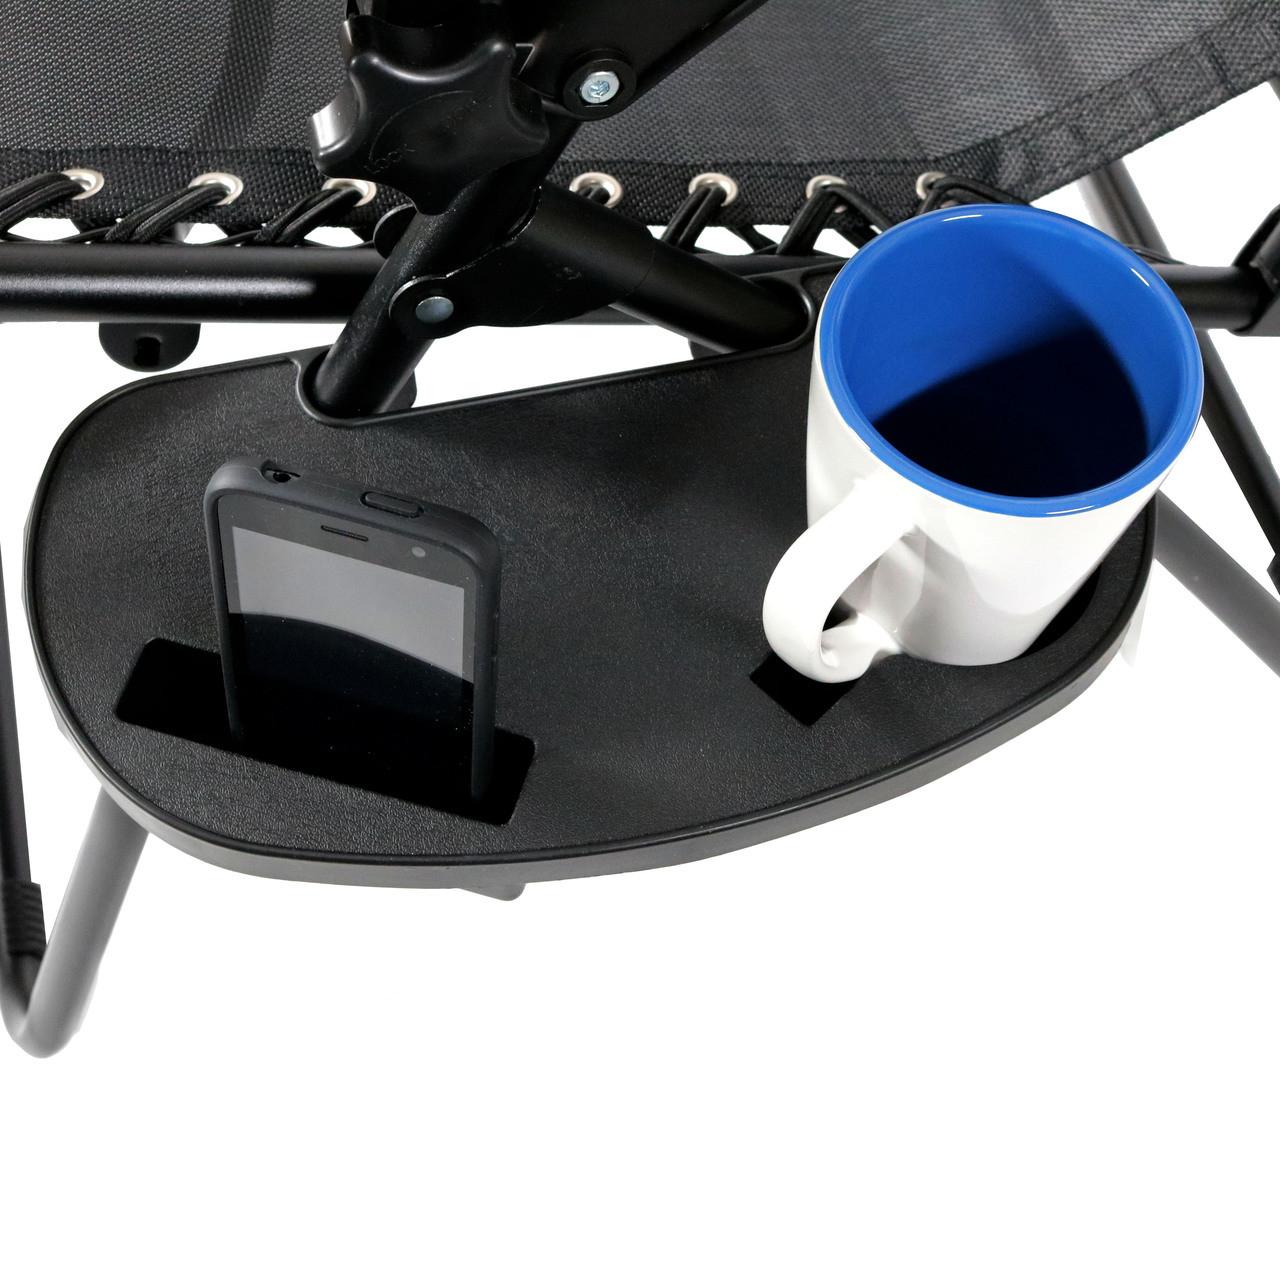 Sunnydaze Zero Gravity Chair Cup Holder Mobile Device Slot